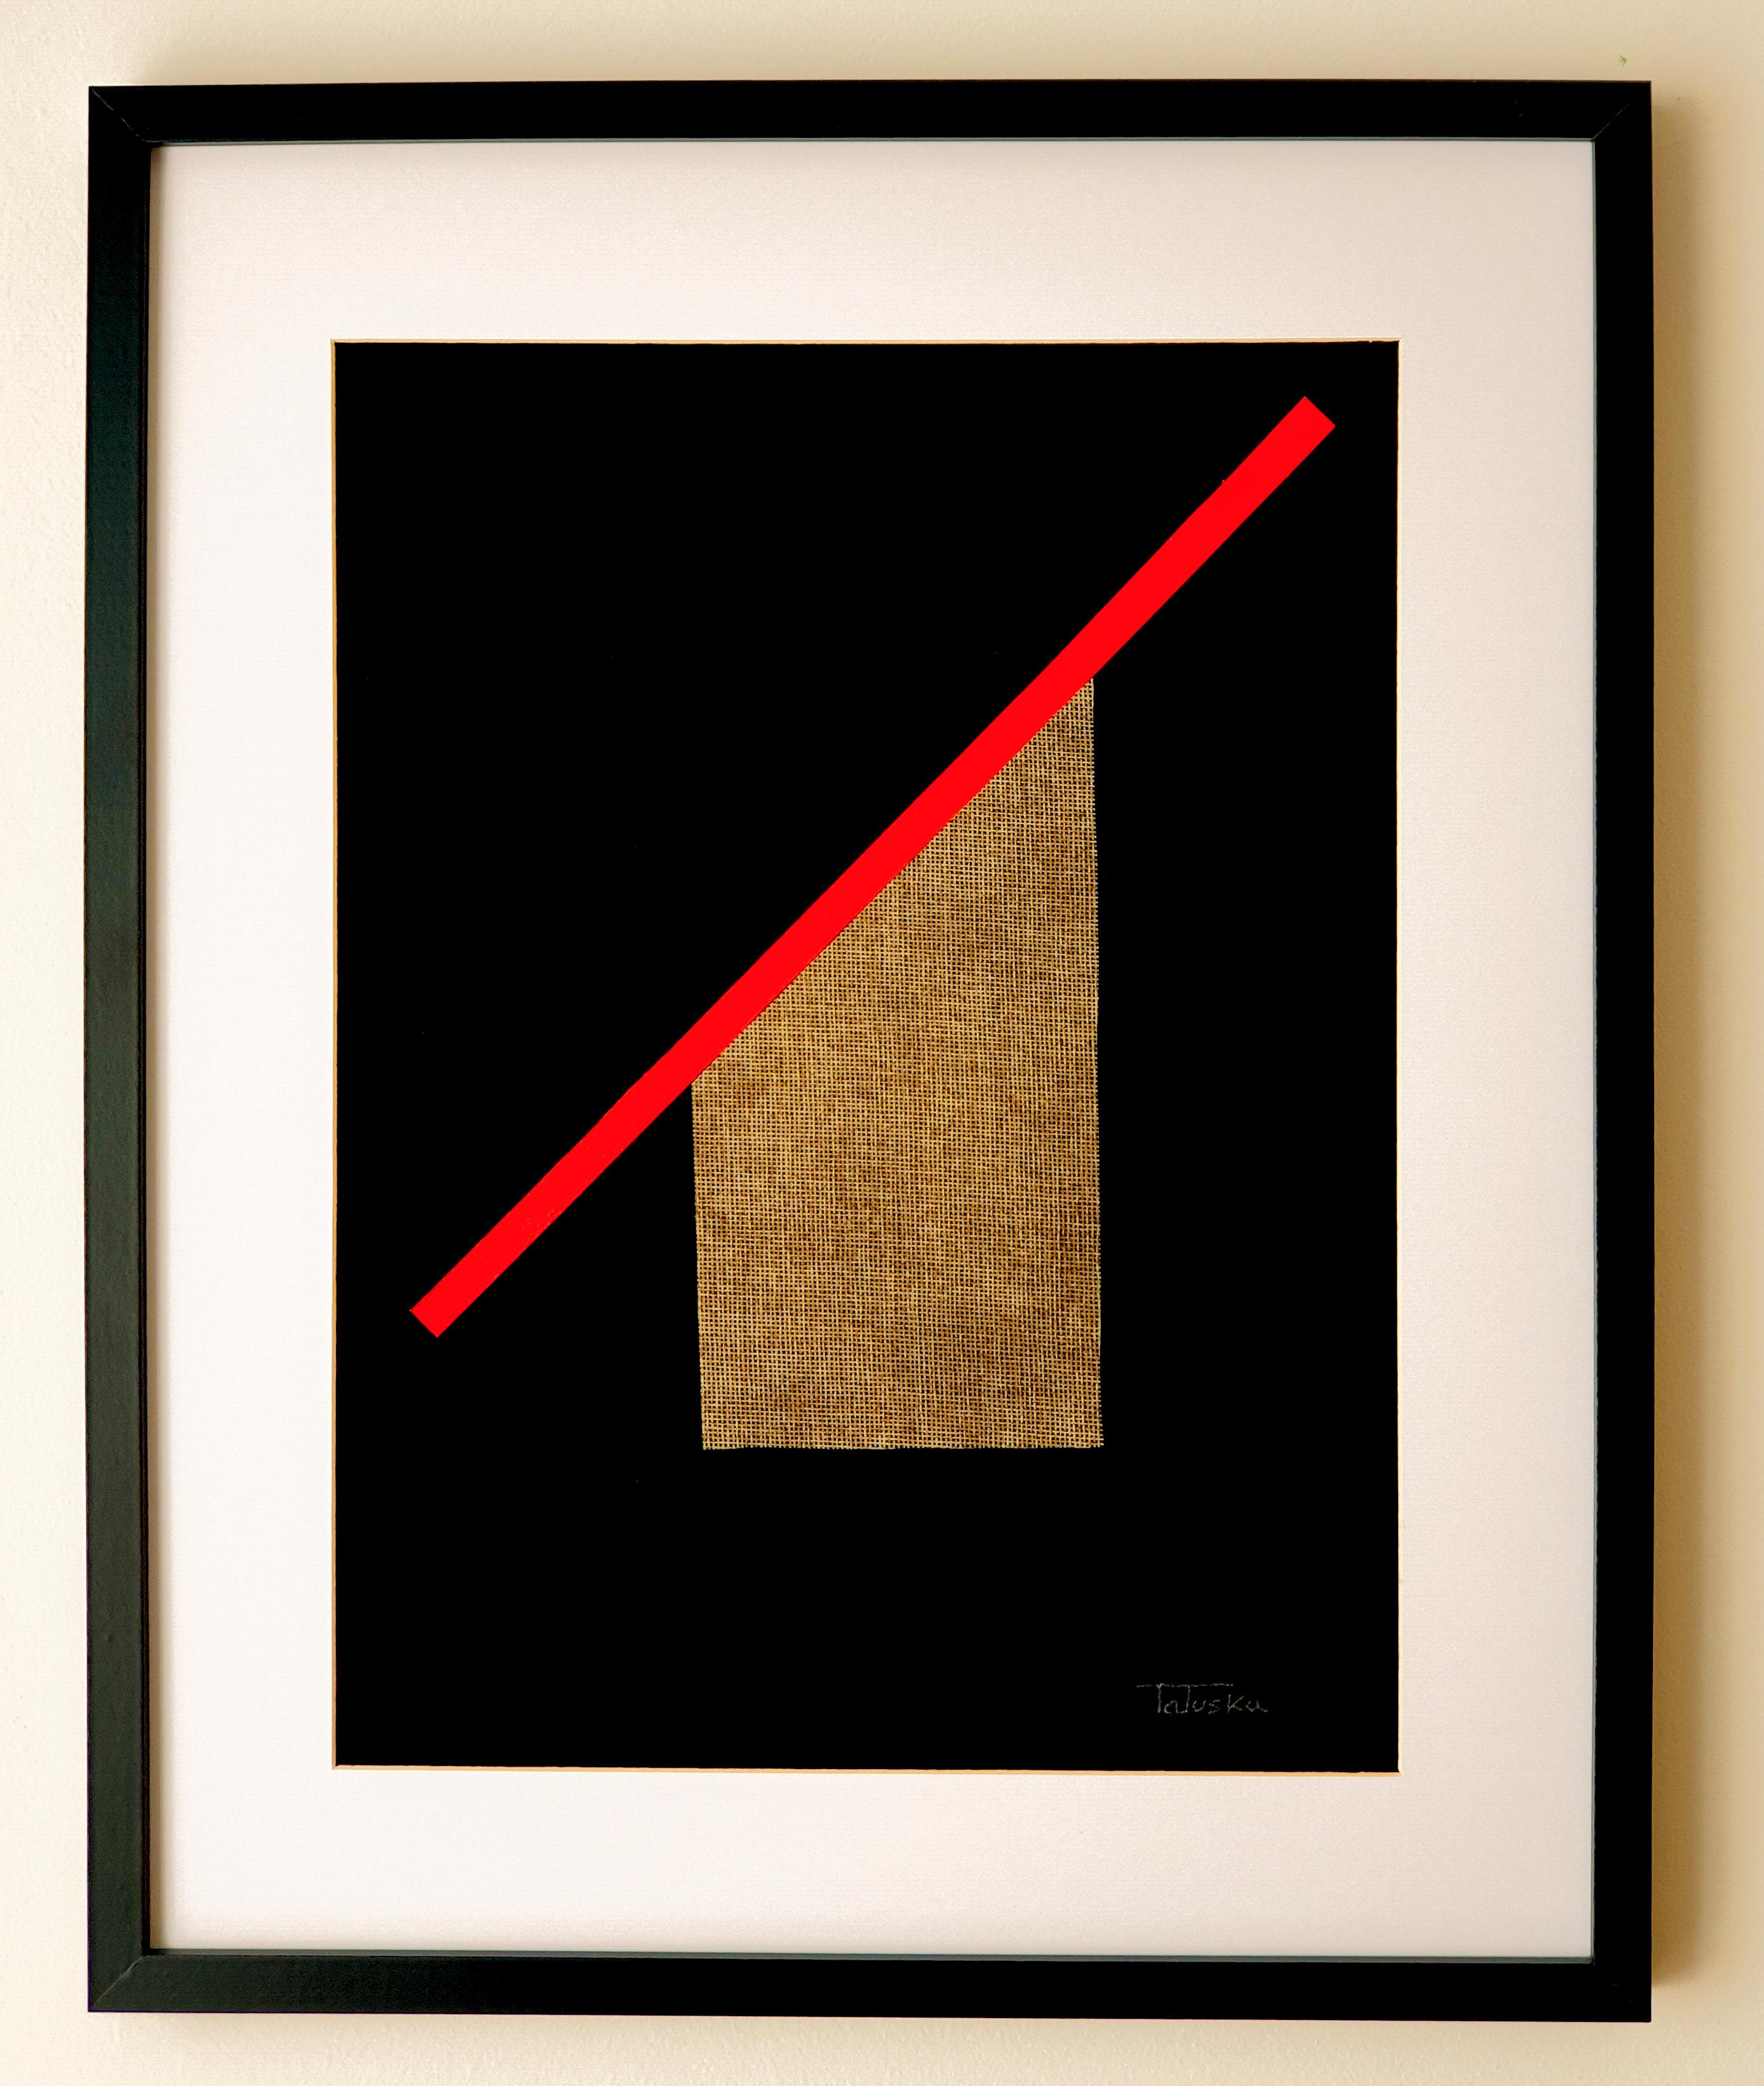 "Cuadro de arte abstracto moderno decorativo con texturas para sala, salón, dormitorio, comedor 40x50 cm. titulado ""Woman in hat"" de la artista Tatuska"